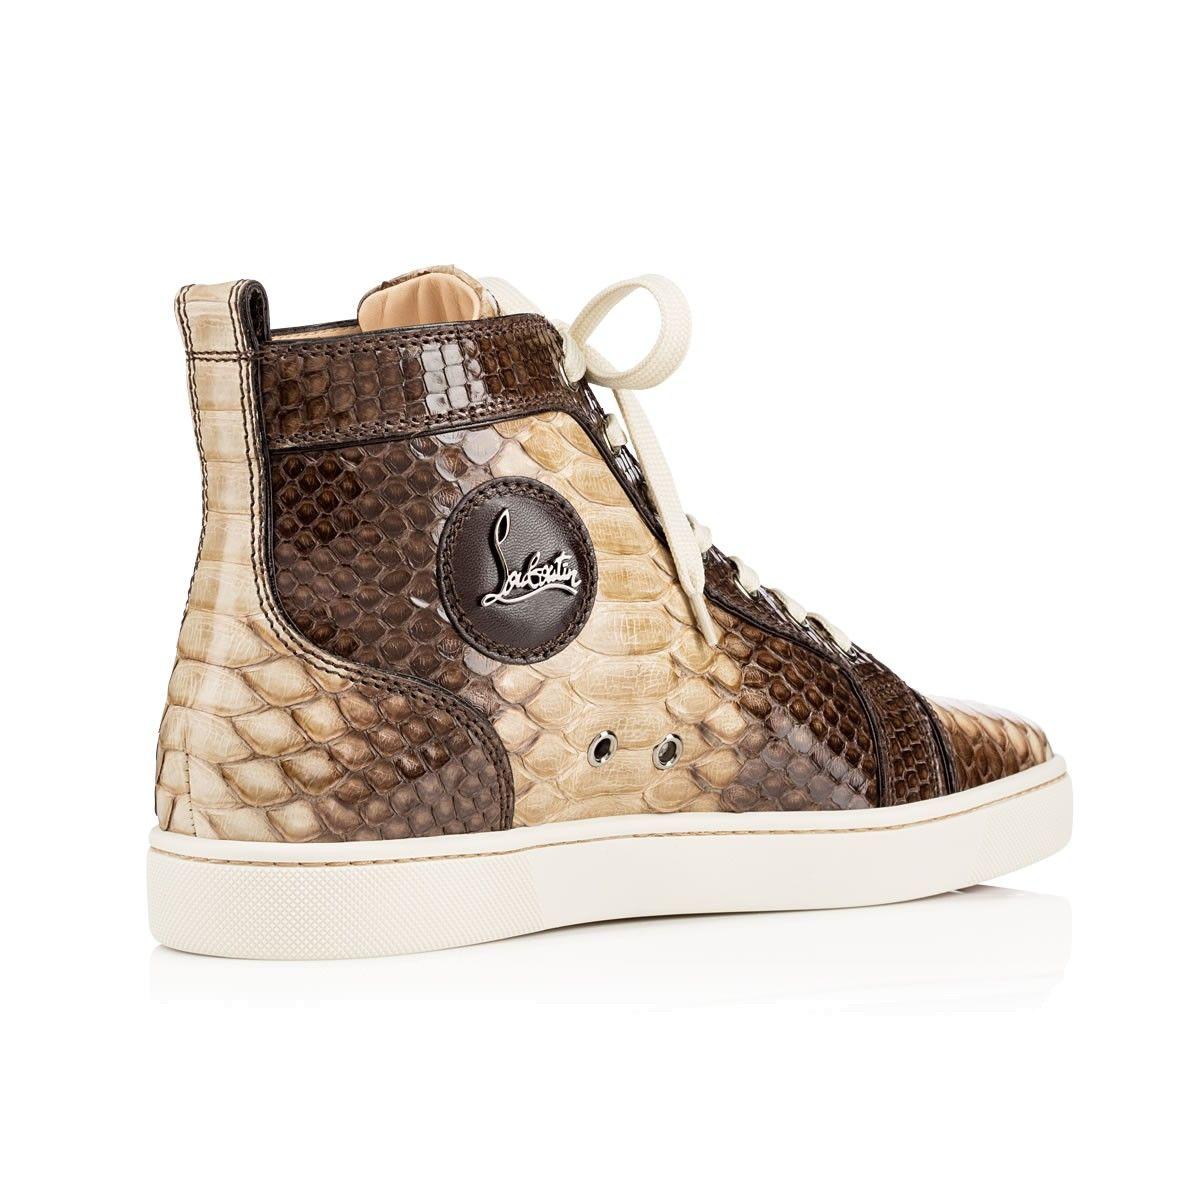 Christian Louboutin - Men's High Top Sneakers: Louis Men's Flat Lichen  Camaieu Python